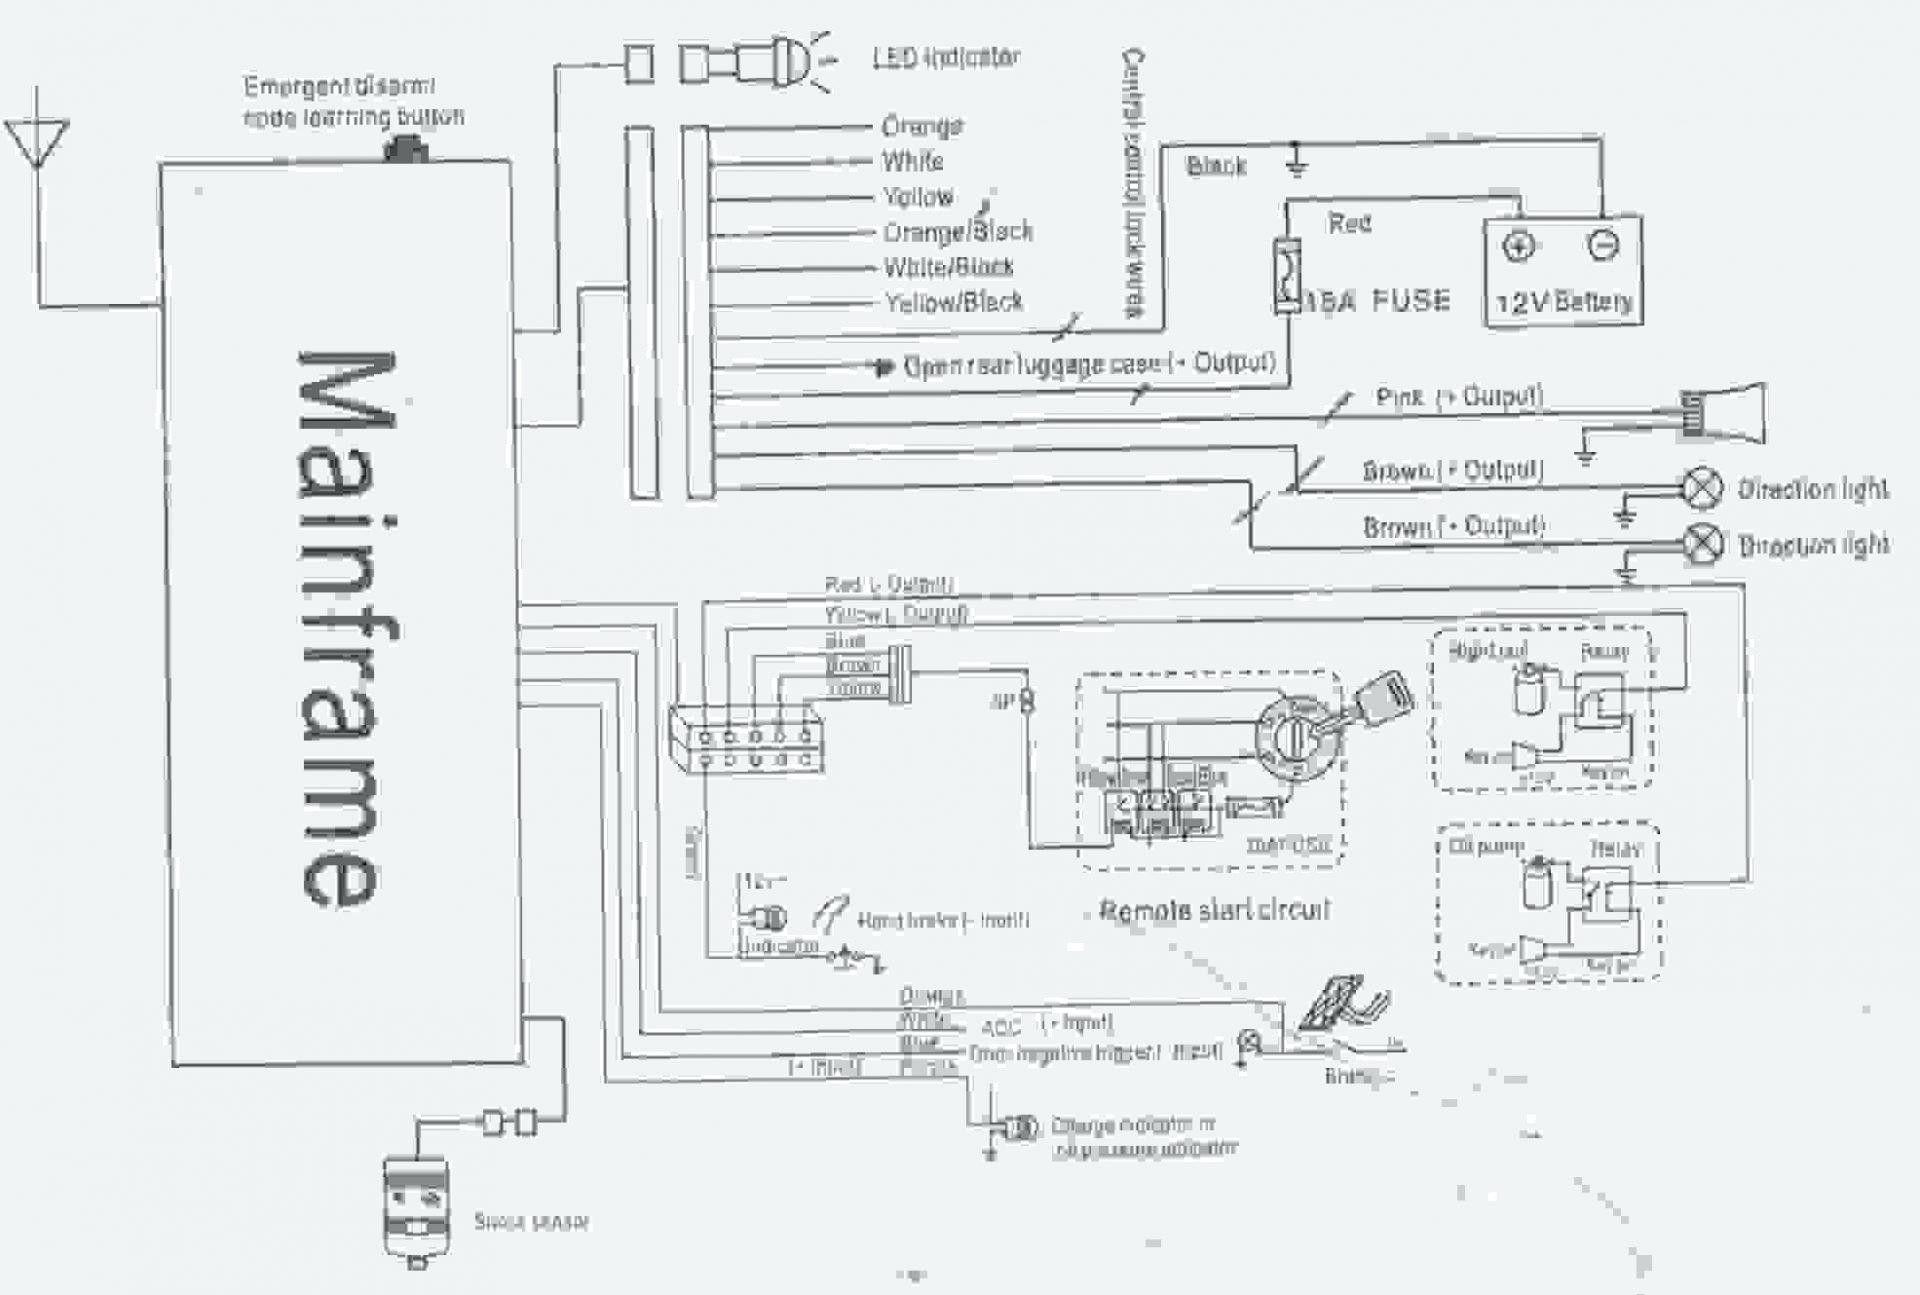 bulldog wire diagram new class a wiring diagram in fire alarm system diagram  wiring diagram in fire alarm system